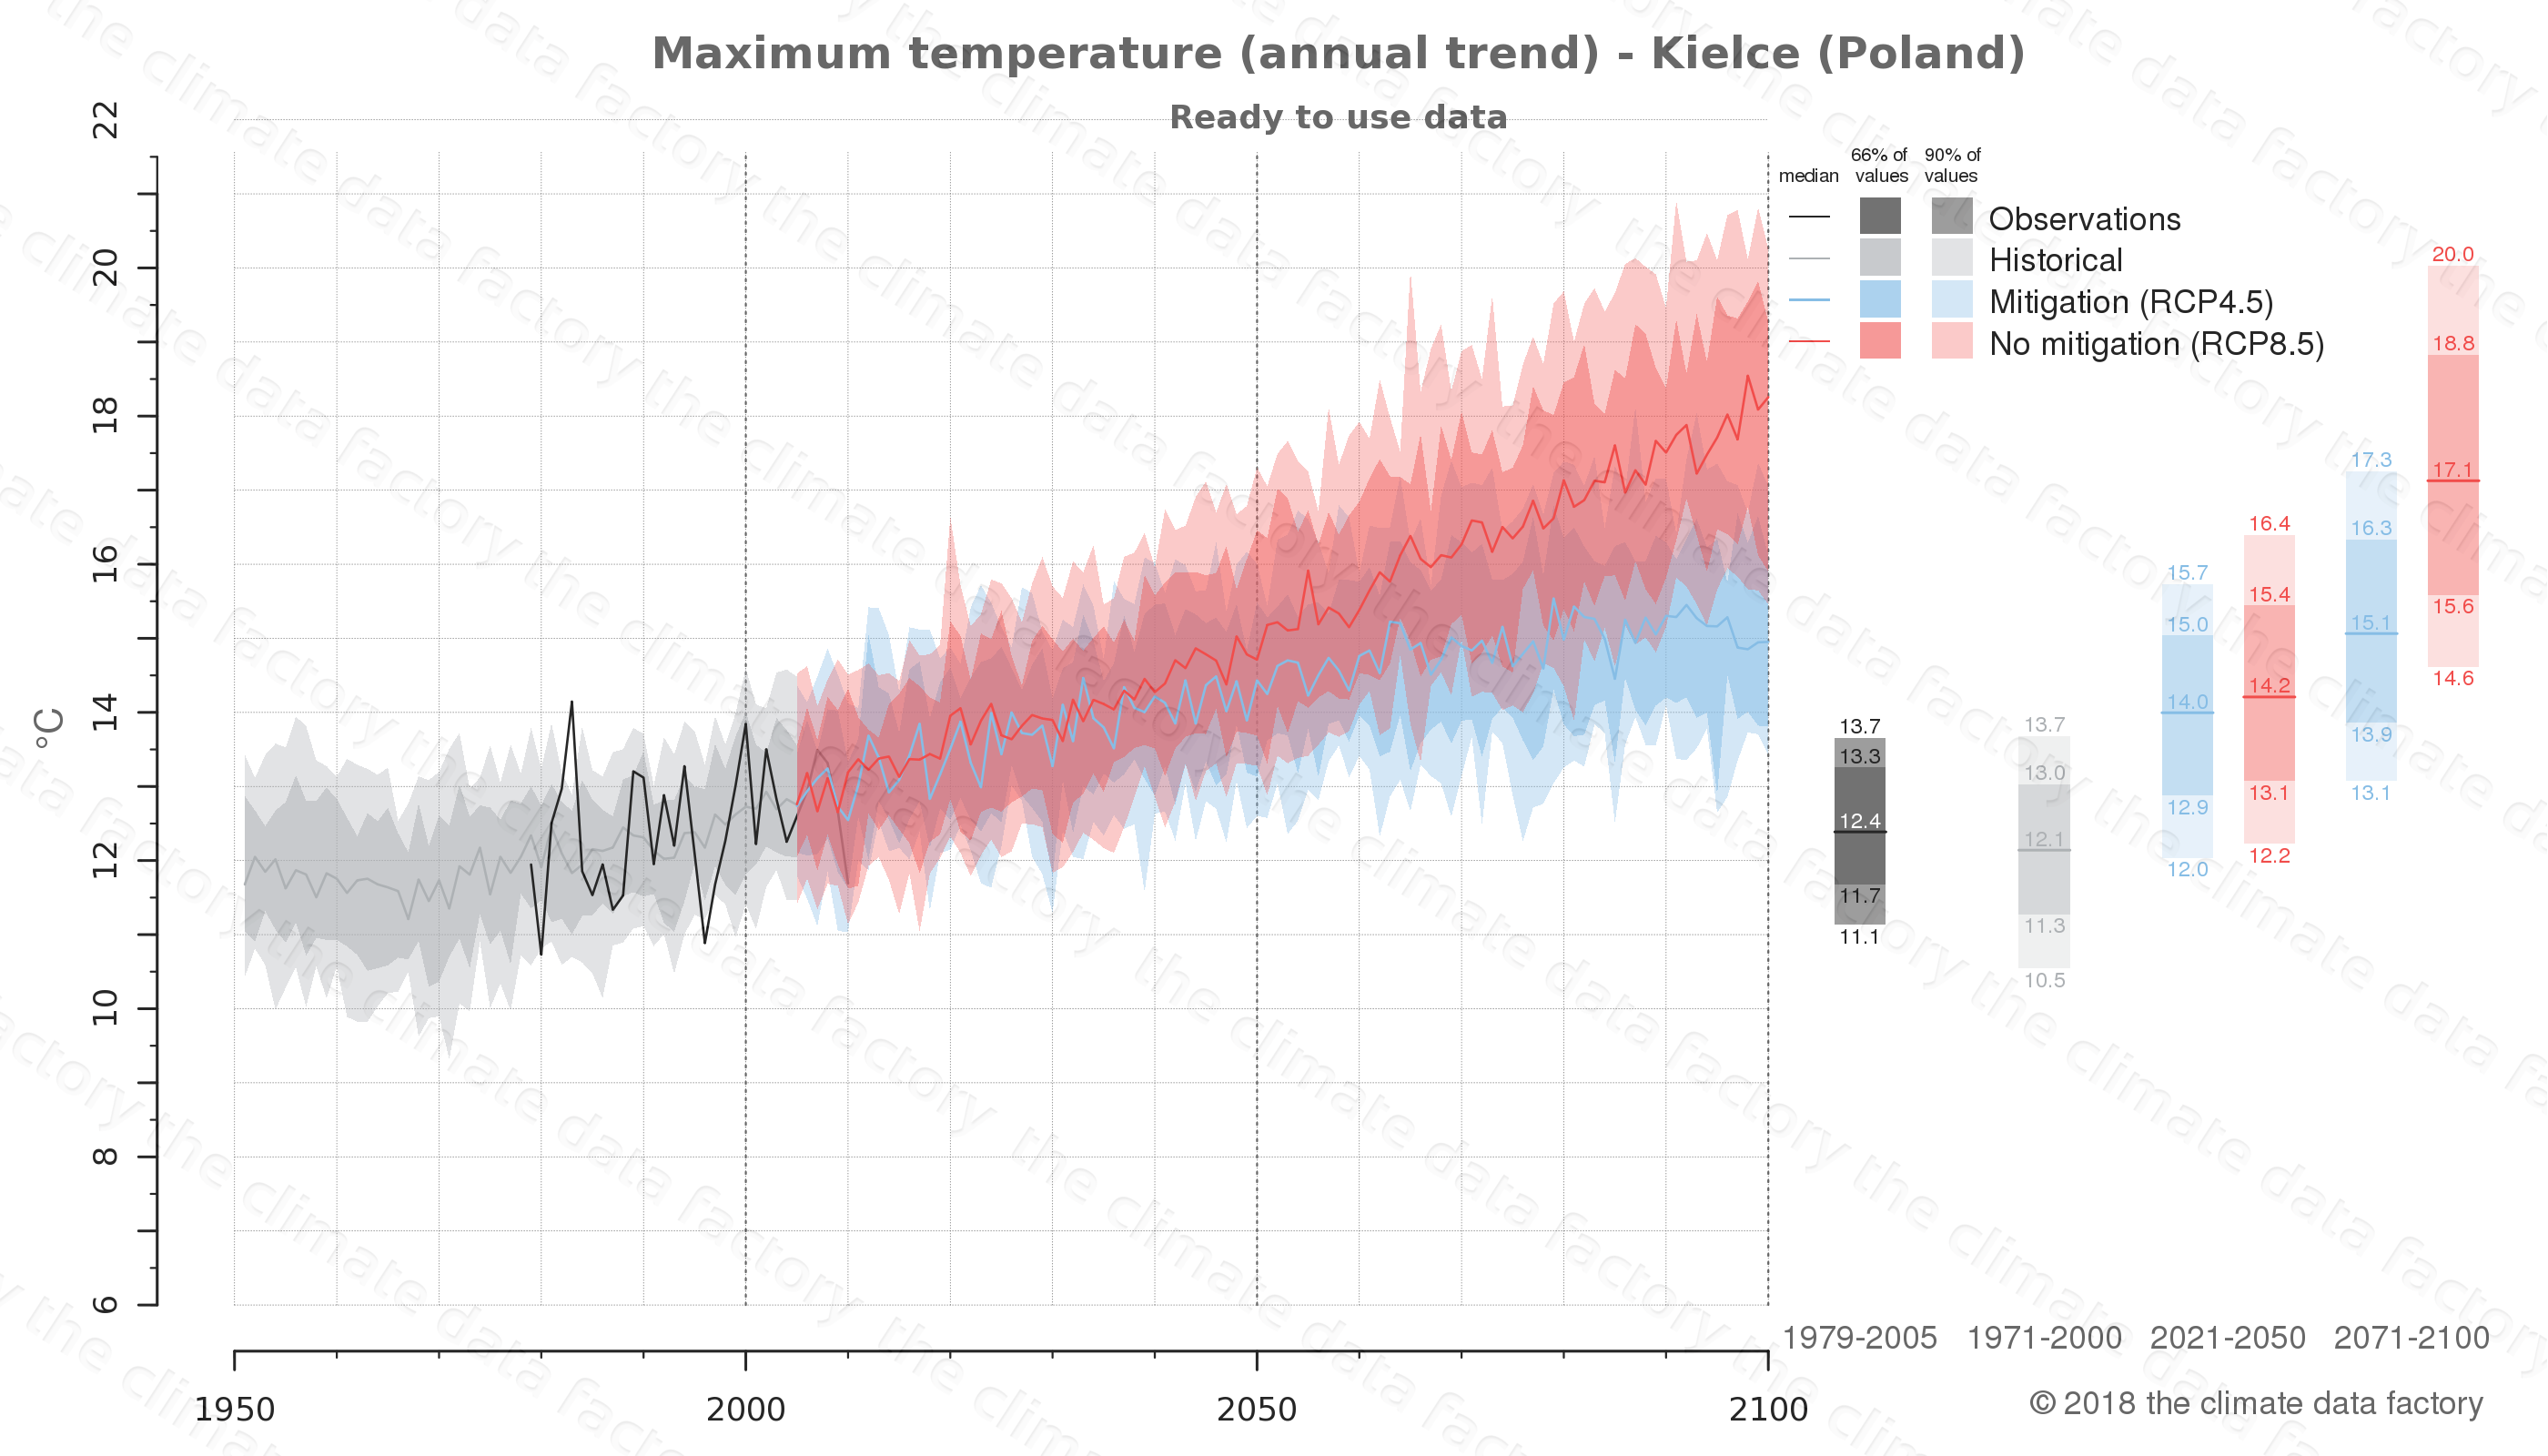 climate change data policy adaptation climate graph city data maximum-temperature kielce poland